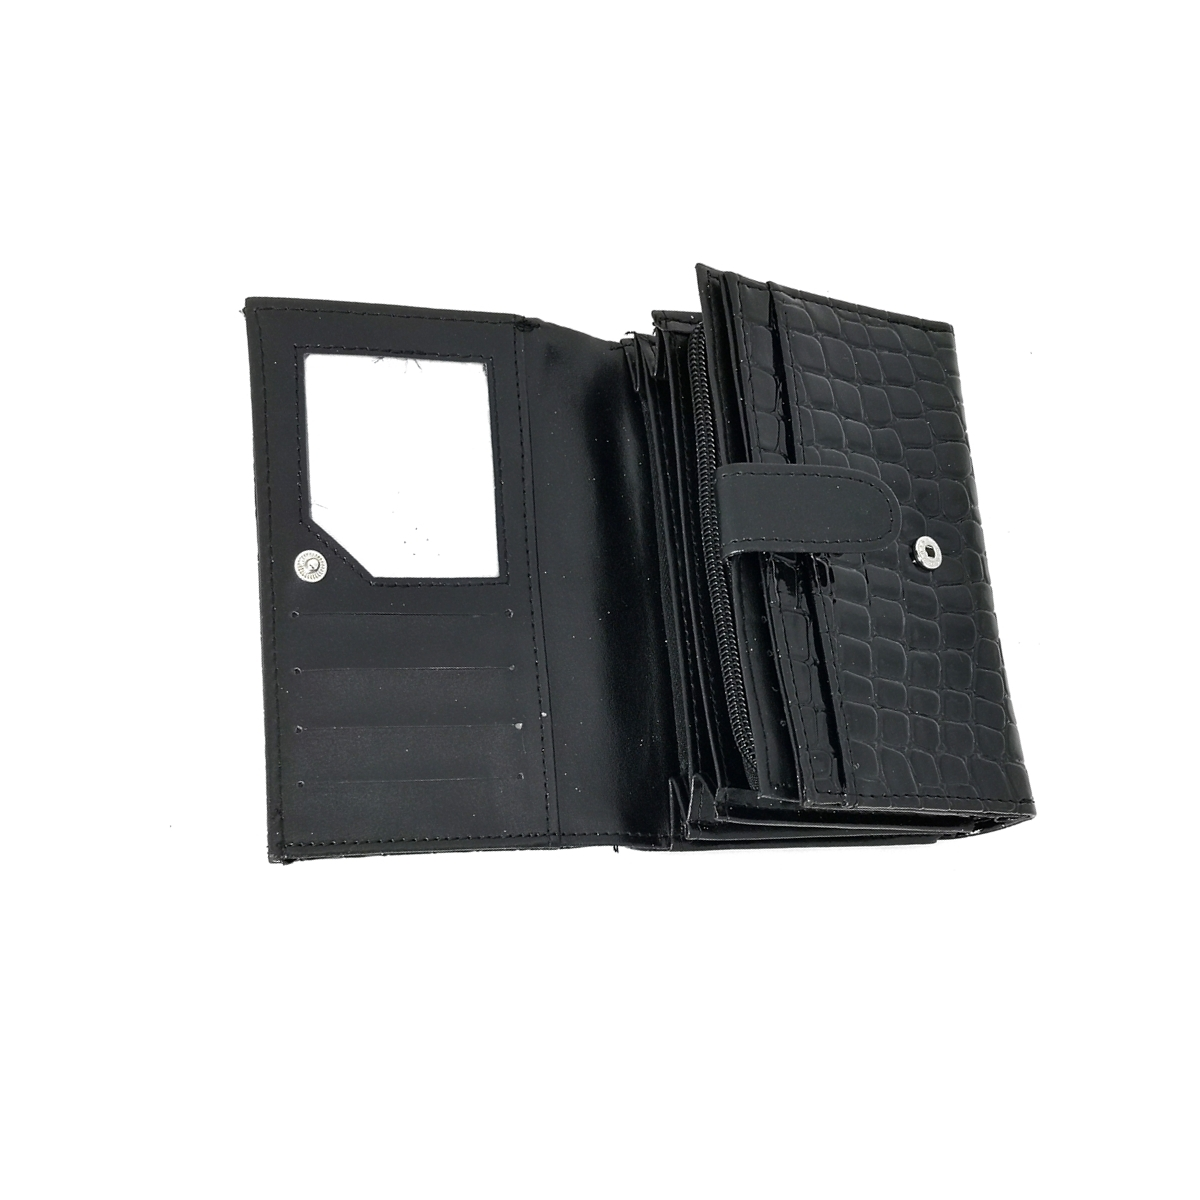 Portofel dama, lacuit, negru, buzunar mare lateral,,din material sintetic,15/10 cm, Magrot 4015